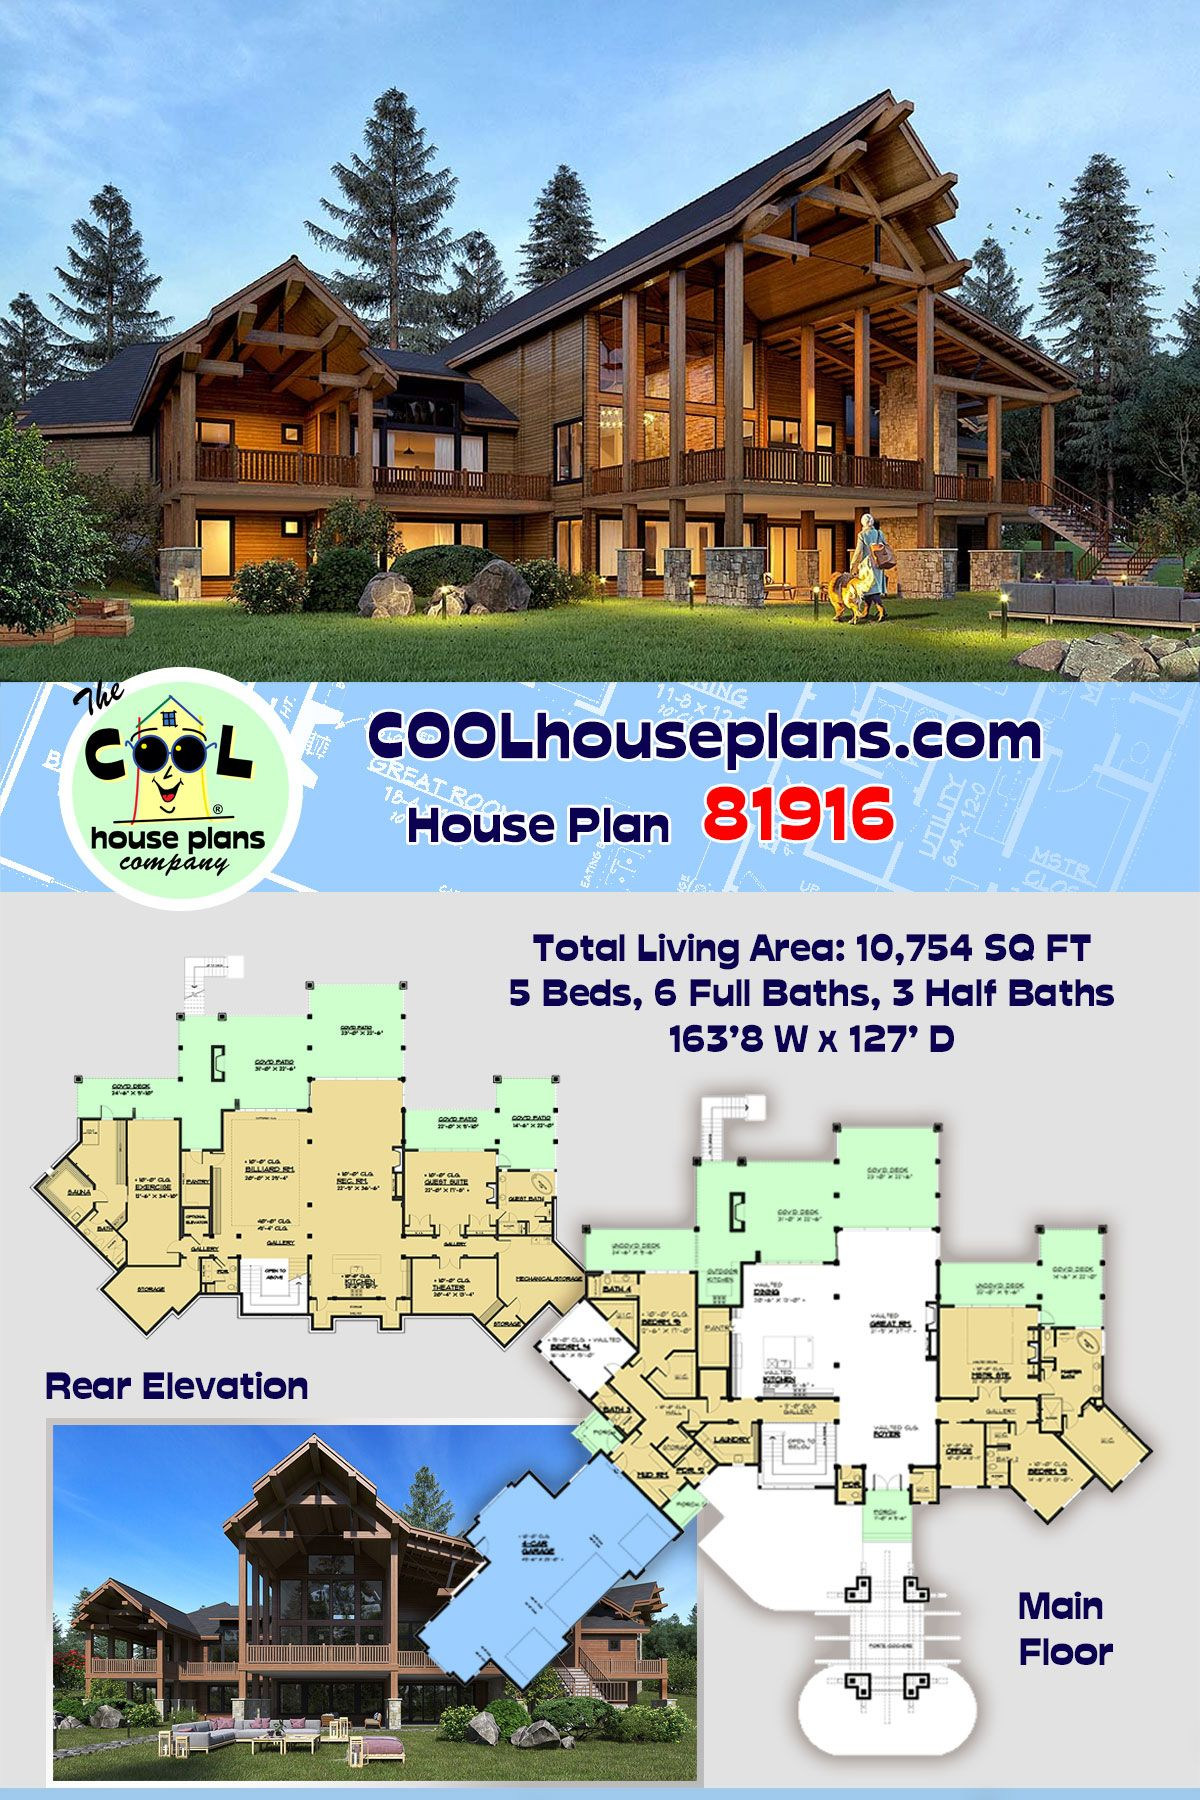 Log Style House Plan 81916 With 5 Bed 9 Bath 4 Car Garage House Plans Luxury House Plans Log Home Plans